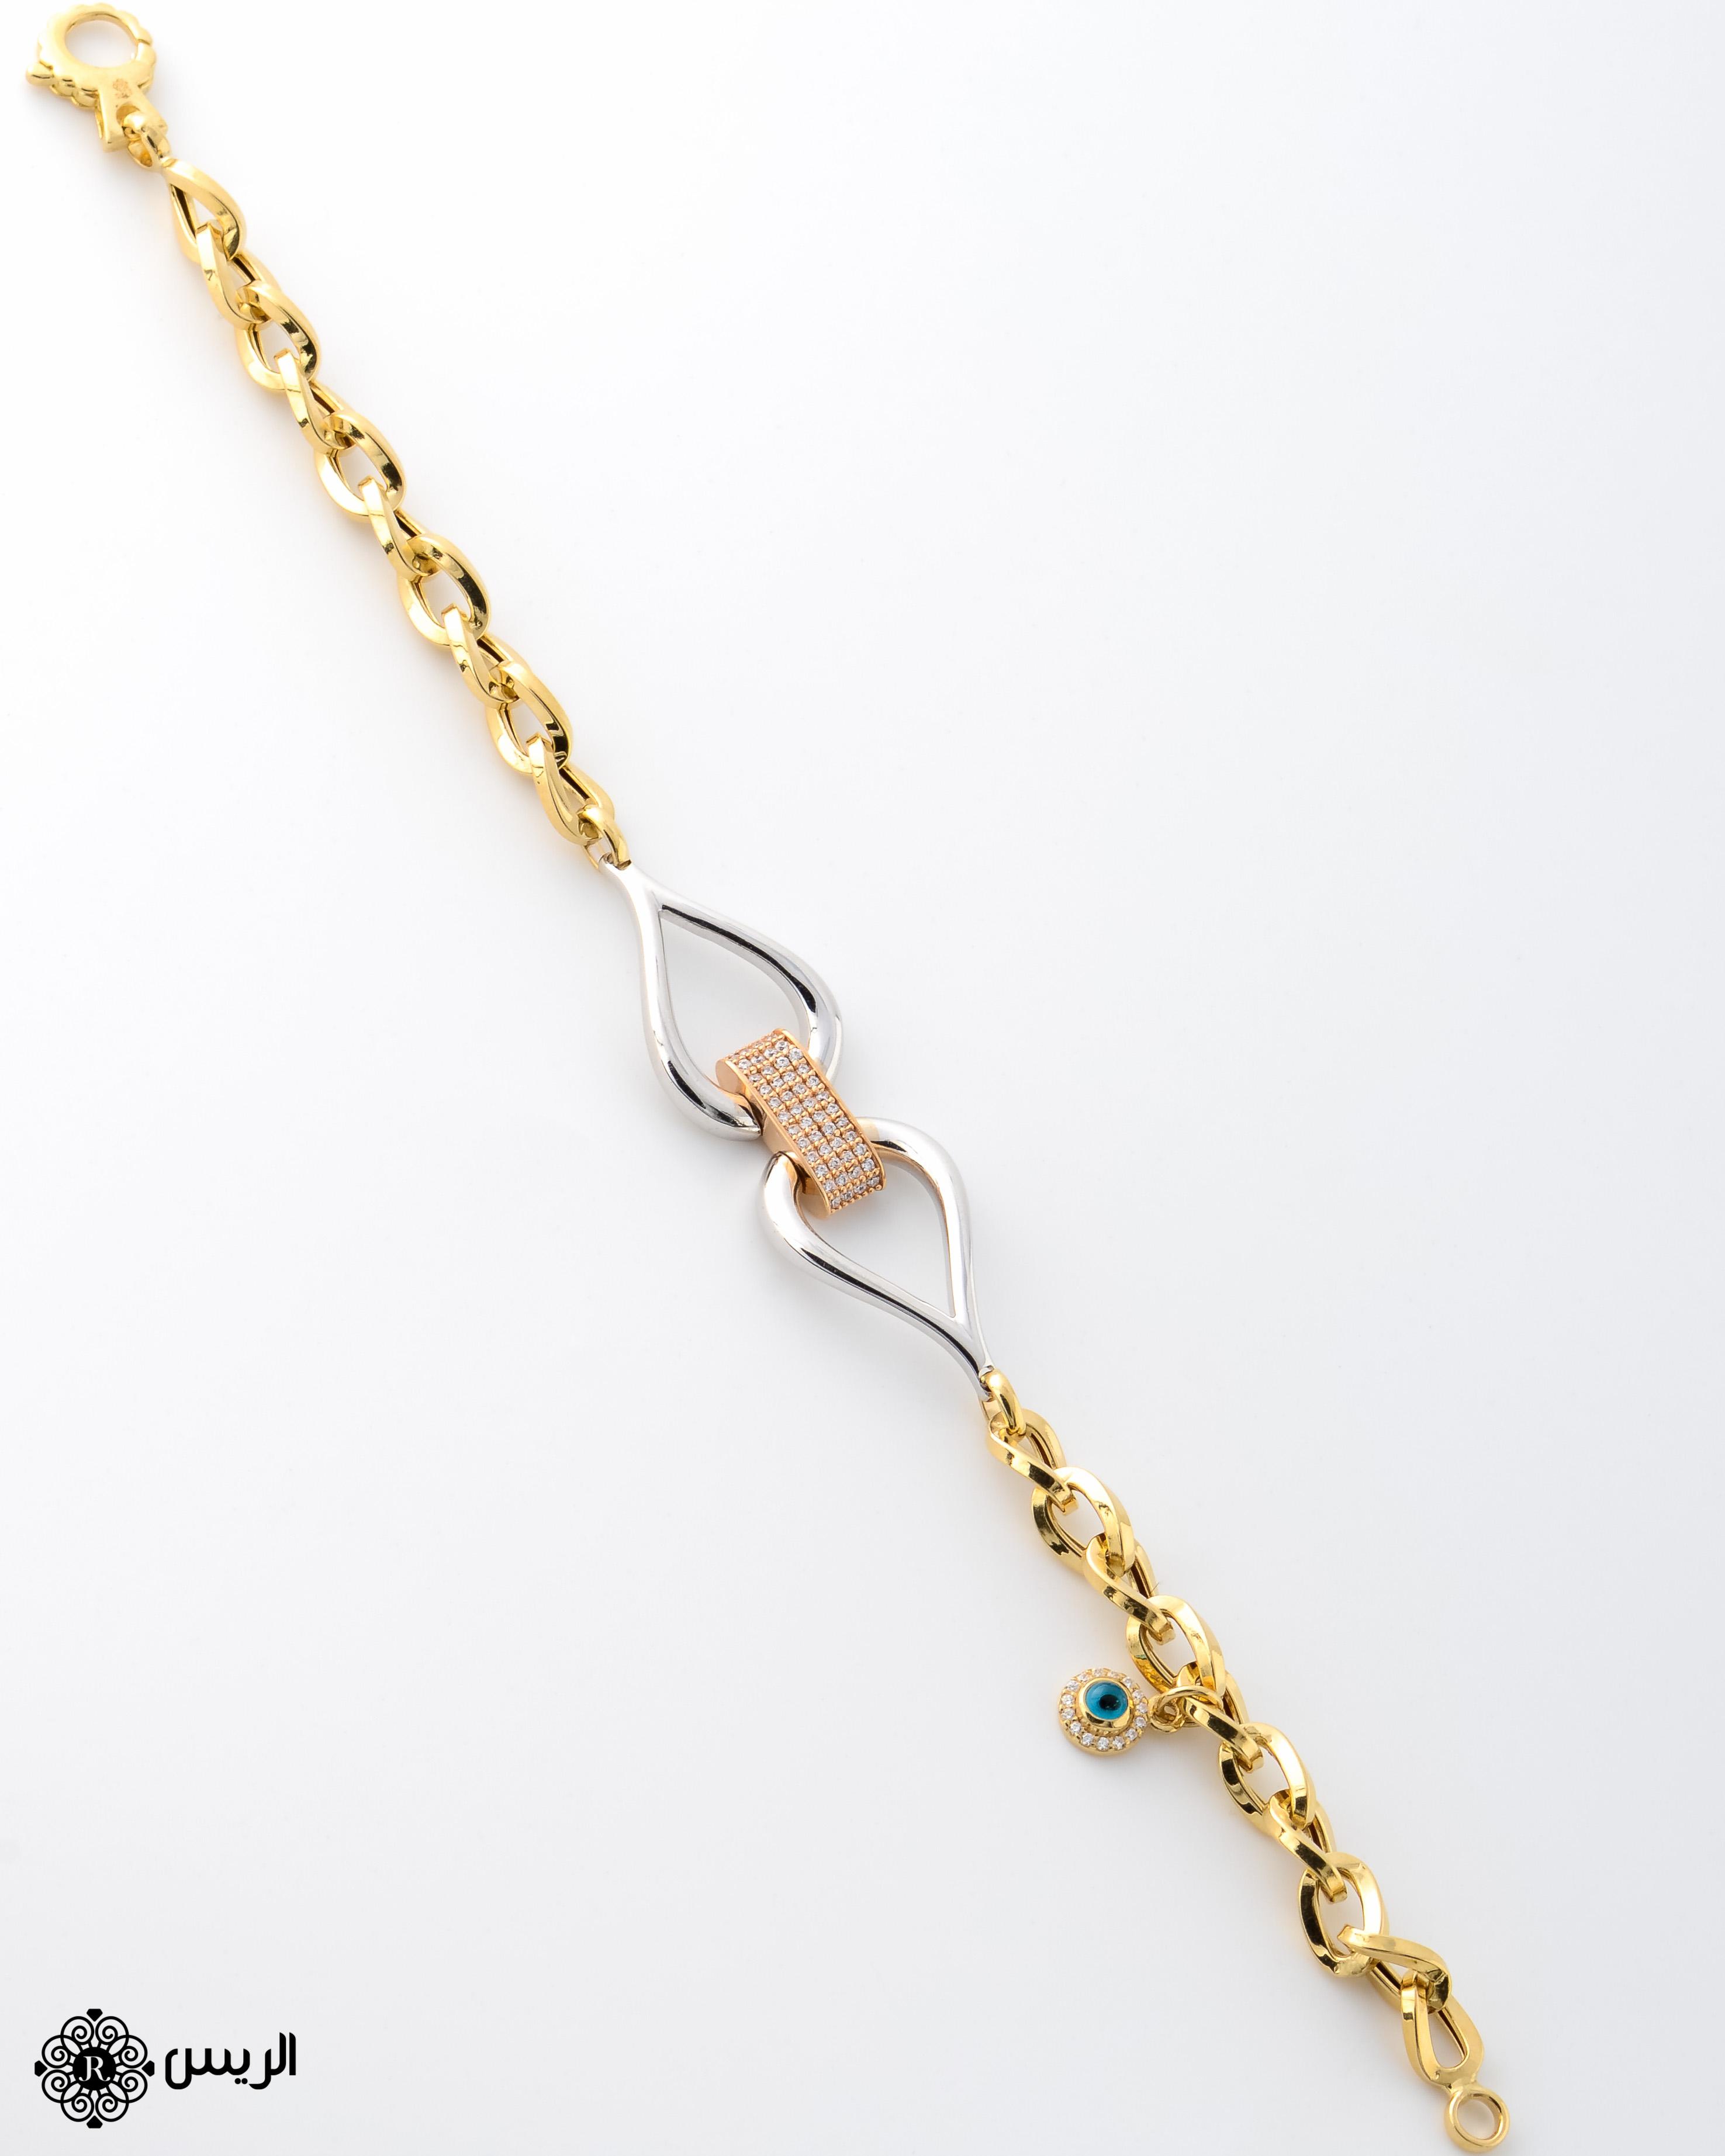 Raies jewelry Bracelet Italian Design إسورة (إنسيالة) تصميم إيطالي الريس للمجوهرات